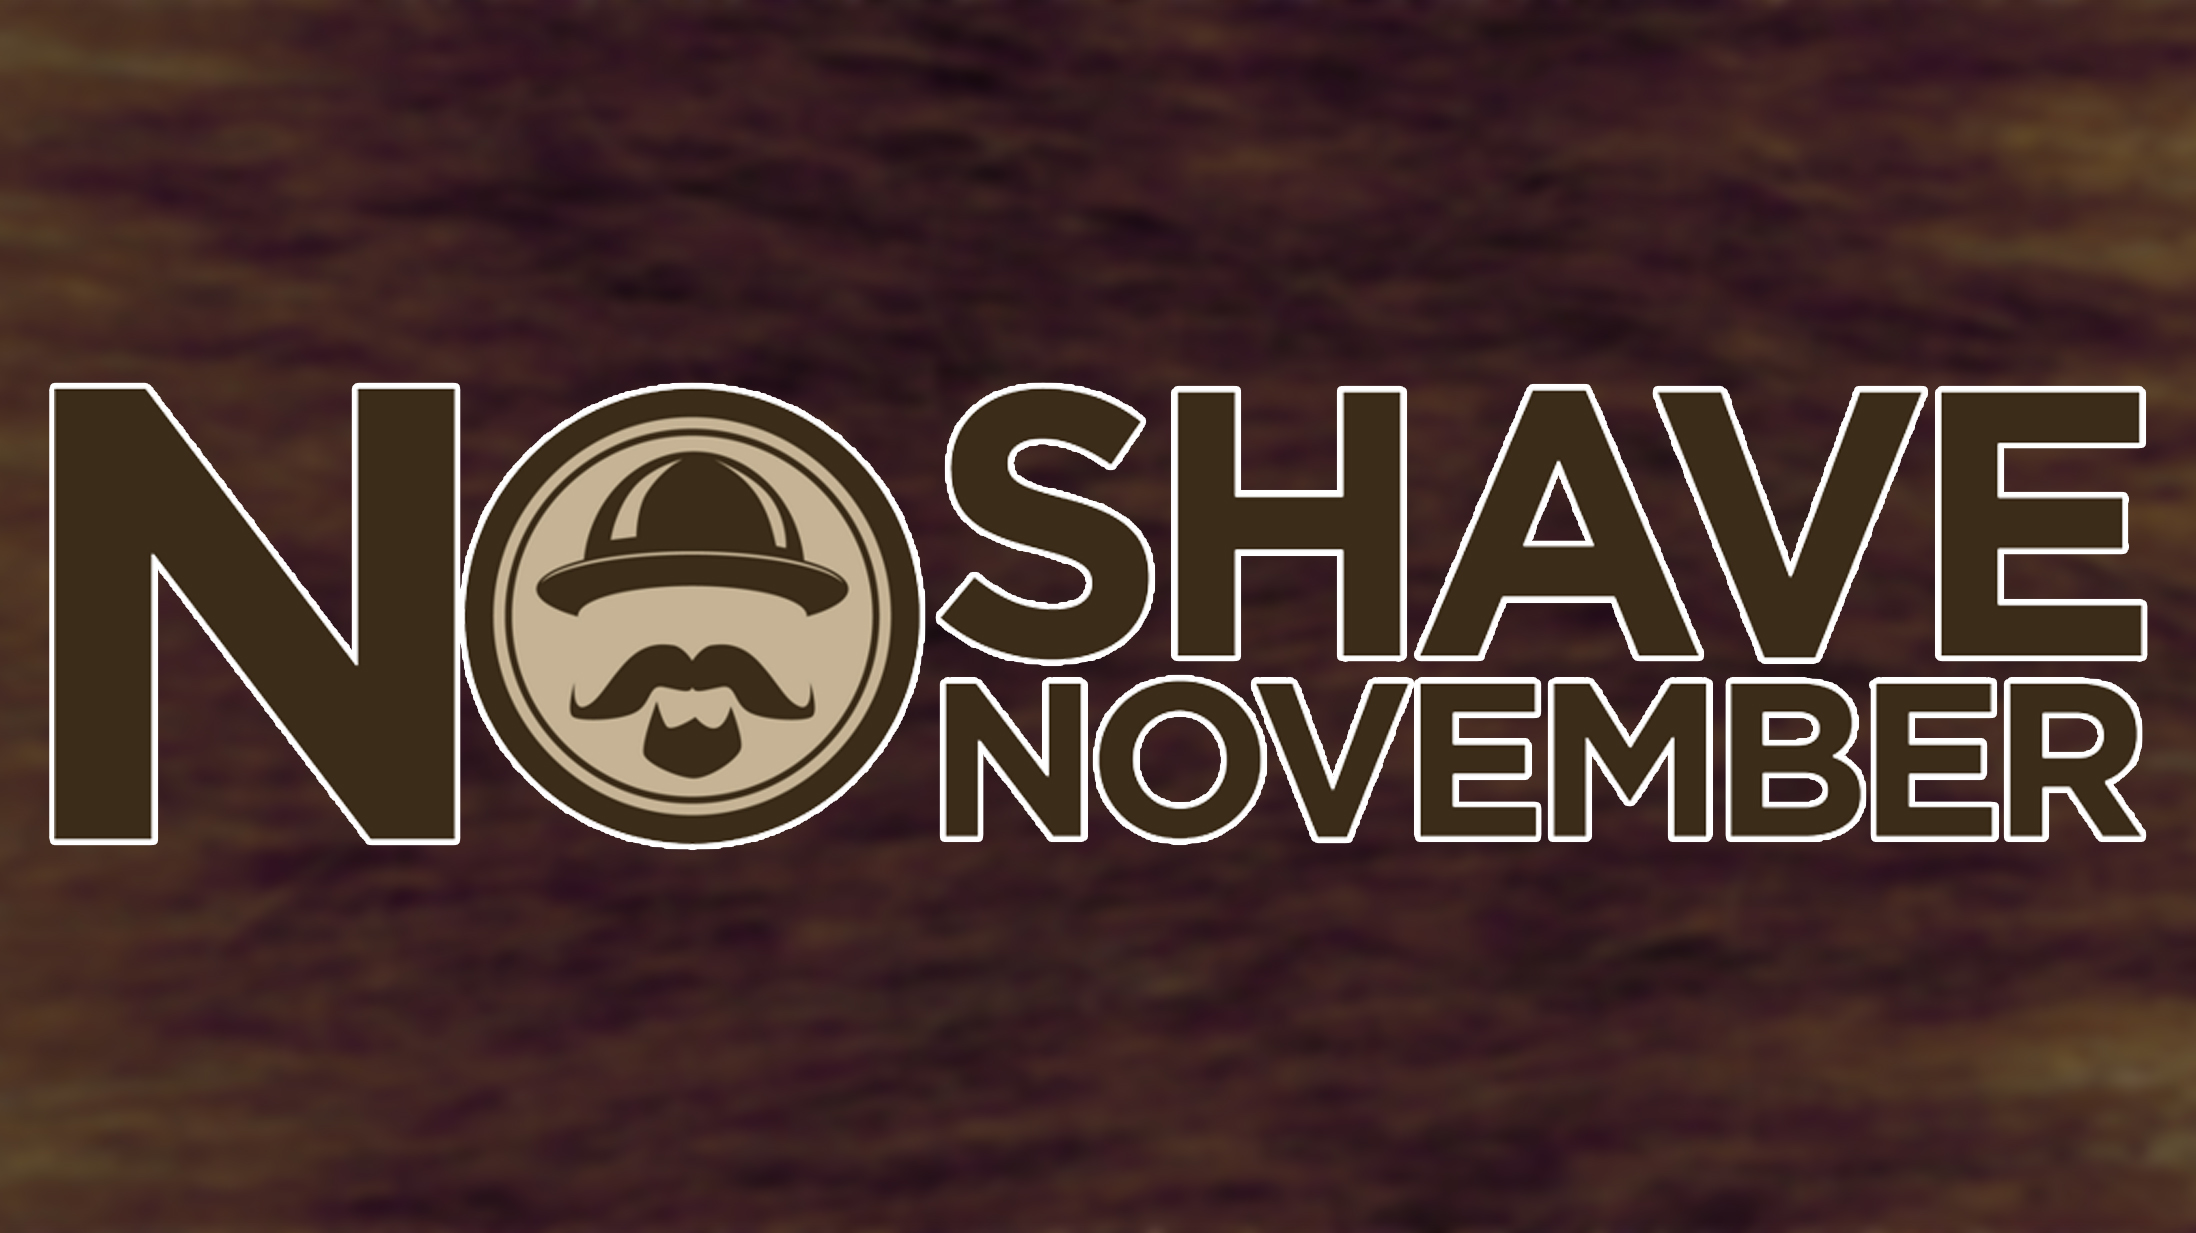 No Shave November 11022015_1448397667024.jpg